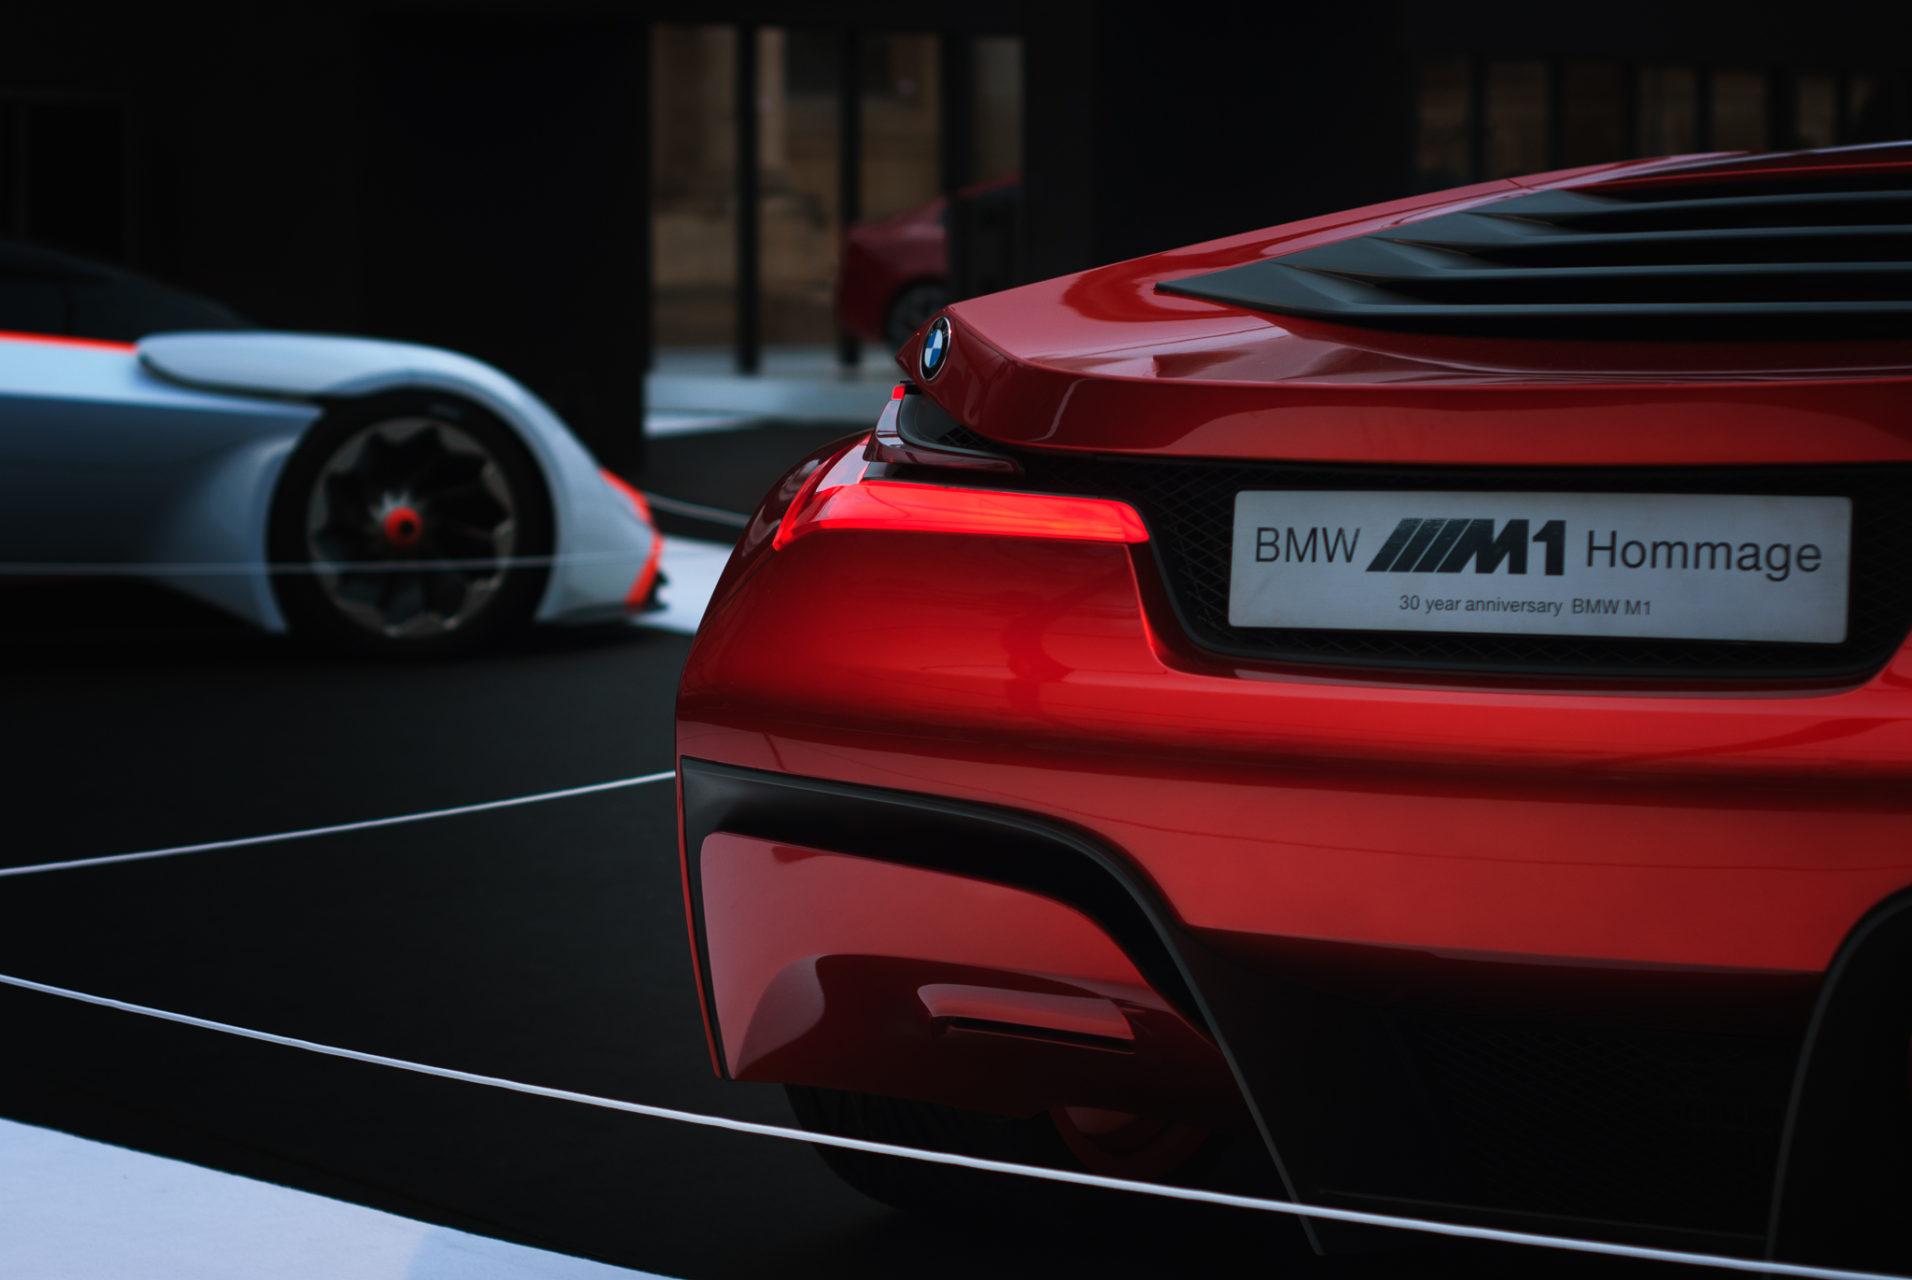 BMW M1 Heritage